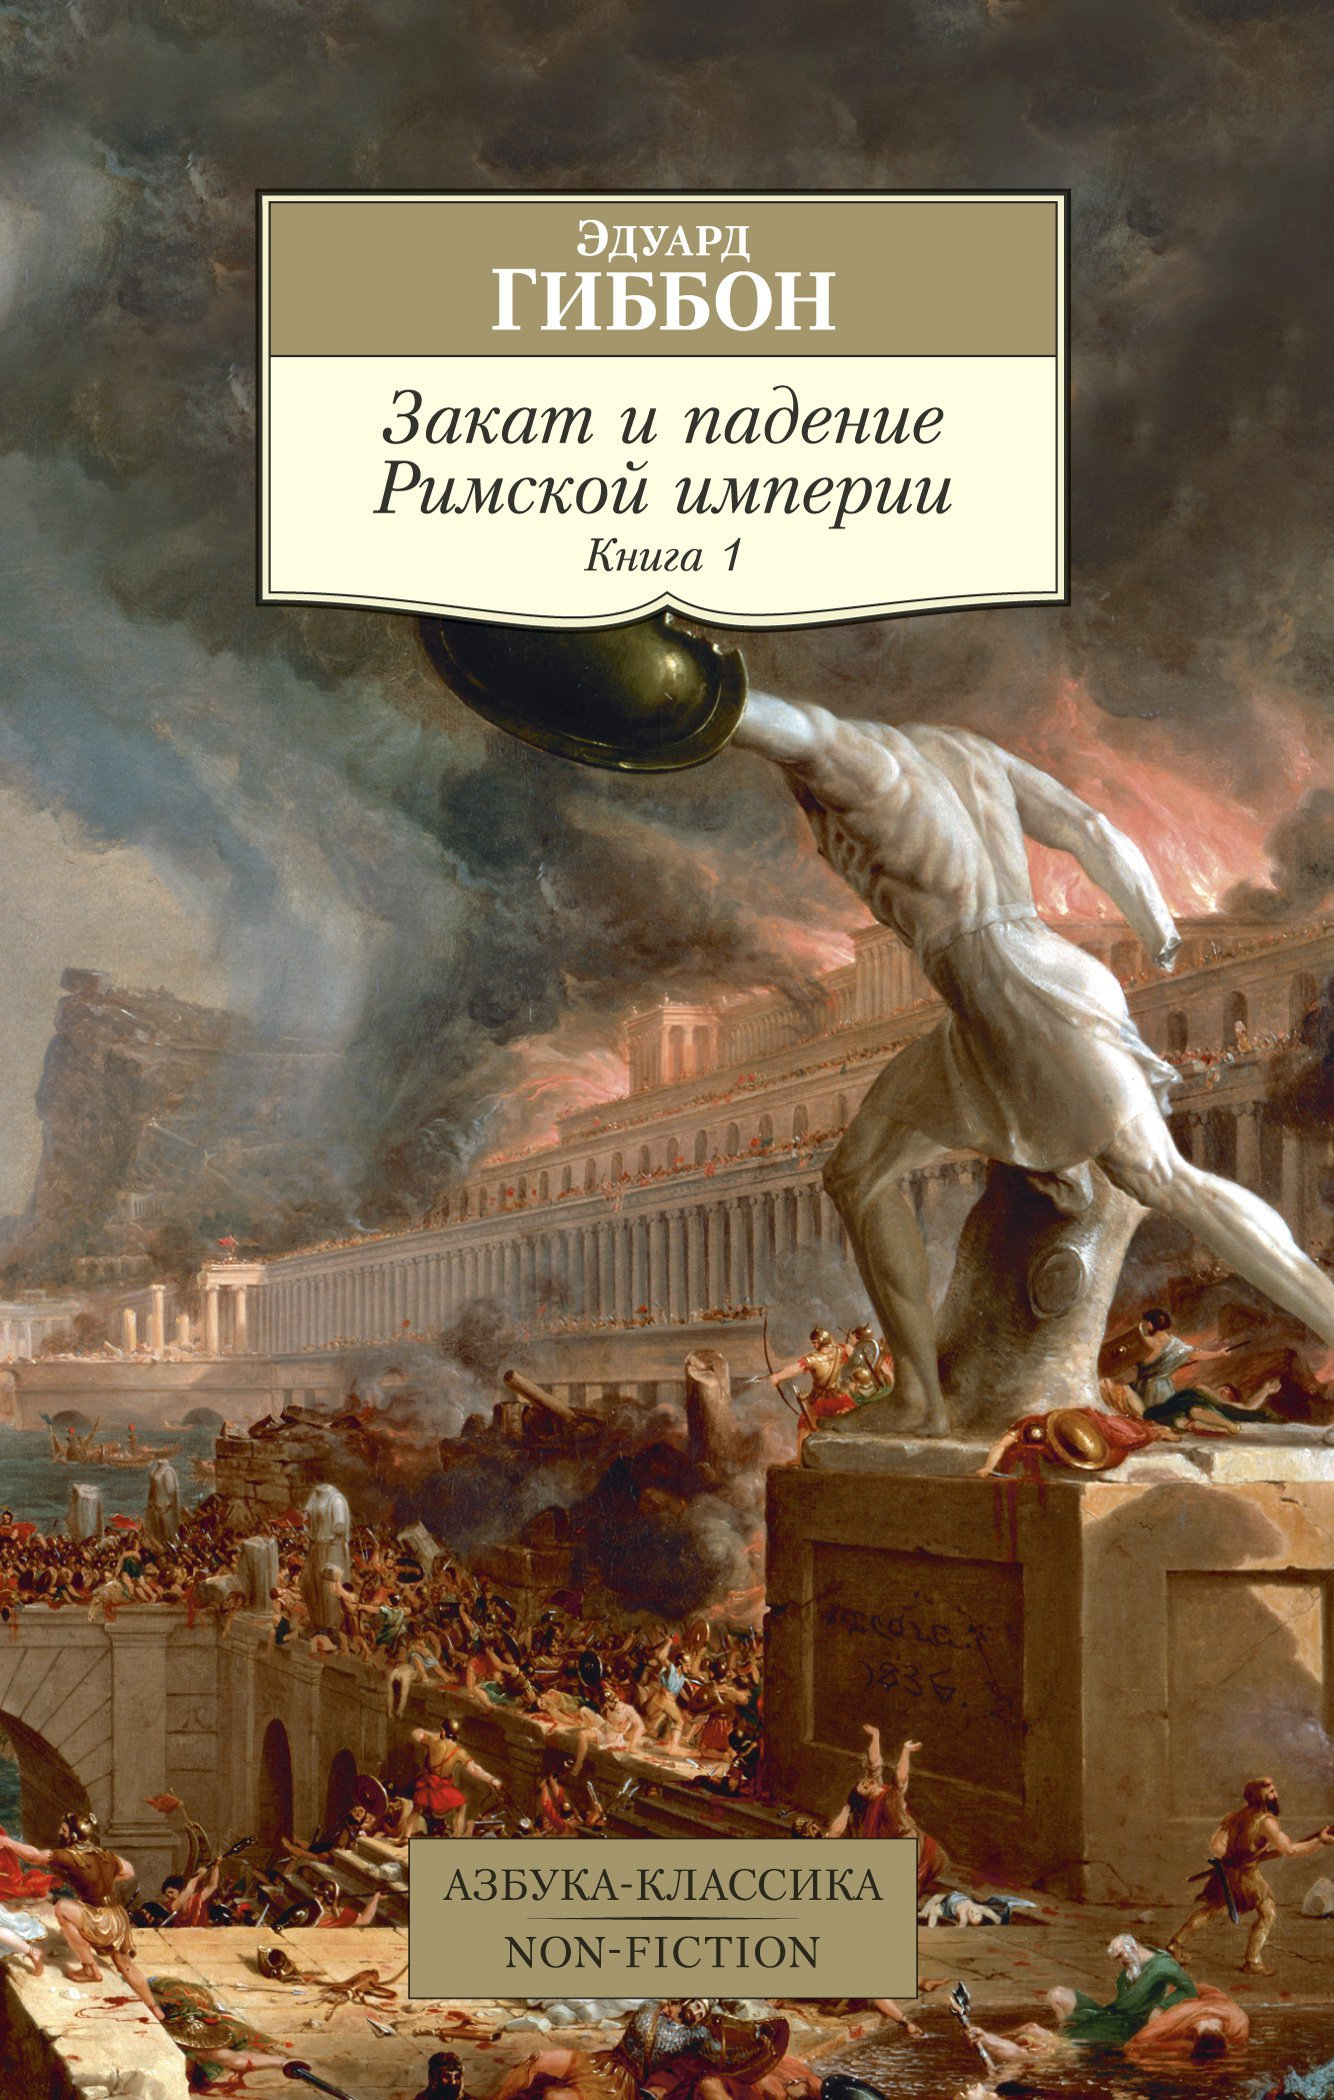 Закат и падение Римской империи. Книга 1 ( Гиббон Эдуард  )